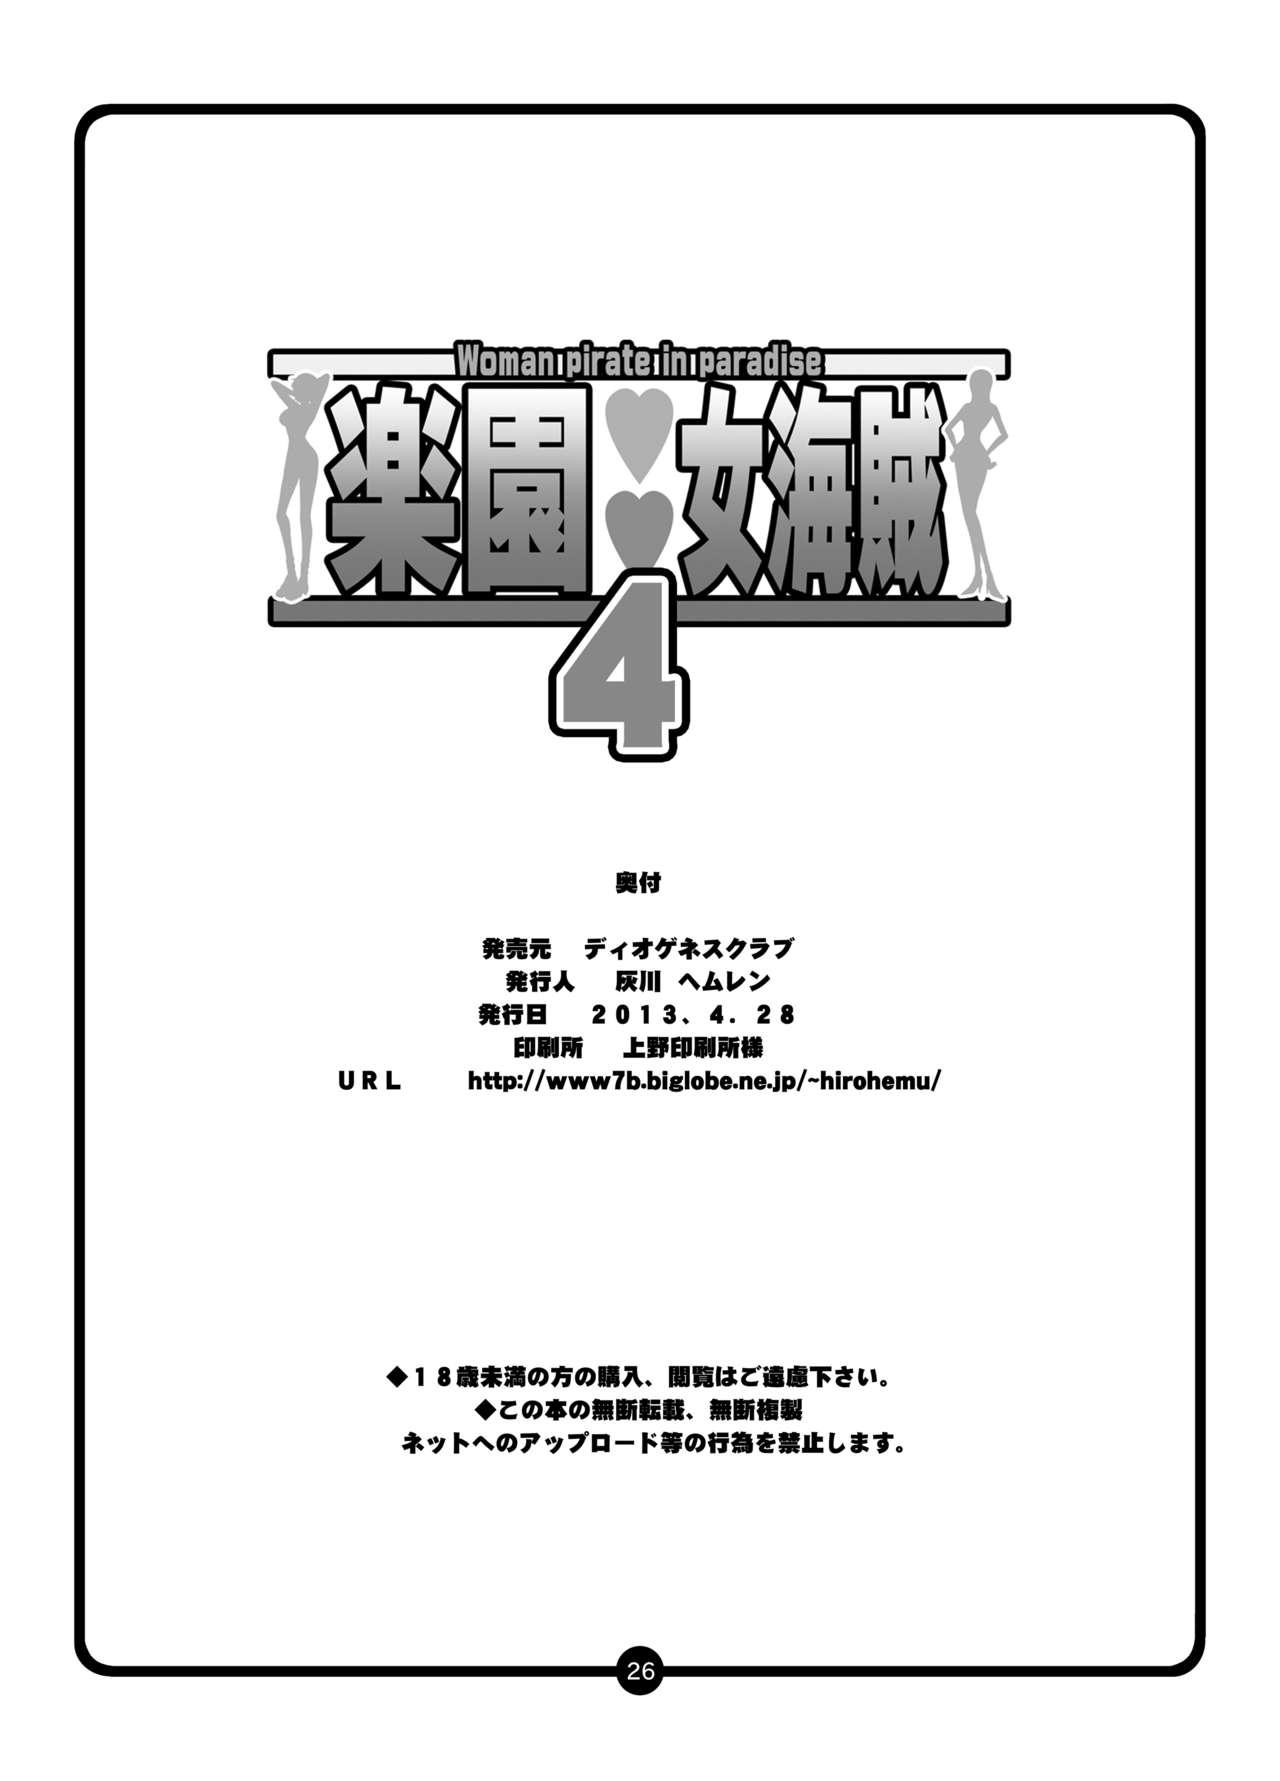 Rakuen Onna Kaizoku 4 - Woman Pirate in Paradise 23